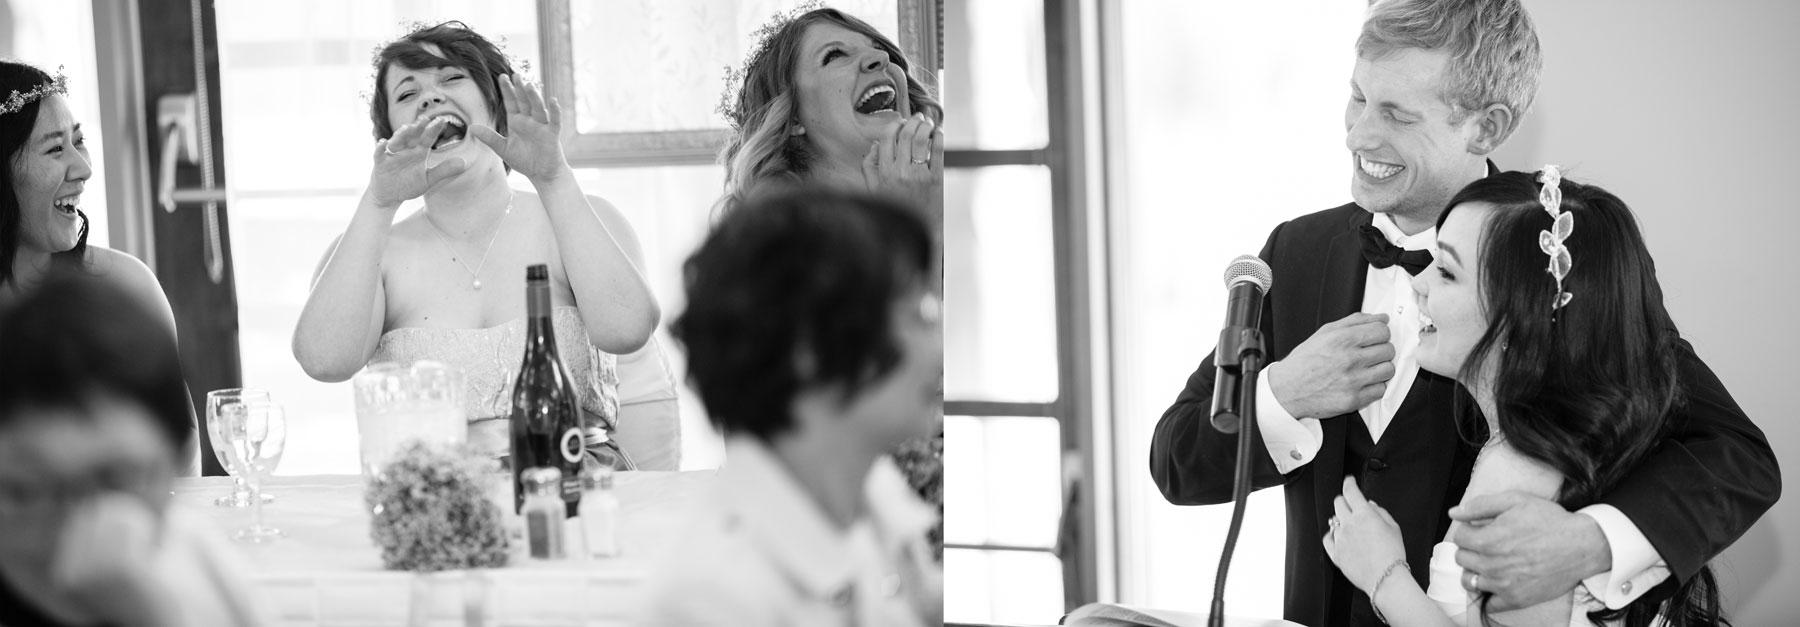 Tina-&-Jordan-Calgary-Wedding-Cochrane-Wedding-Cochrane-Ranchehouse-Olson-Studios-(35)